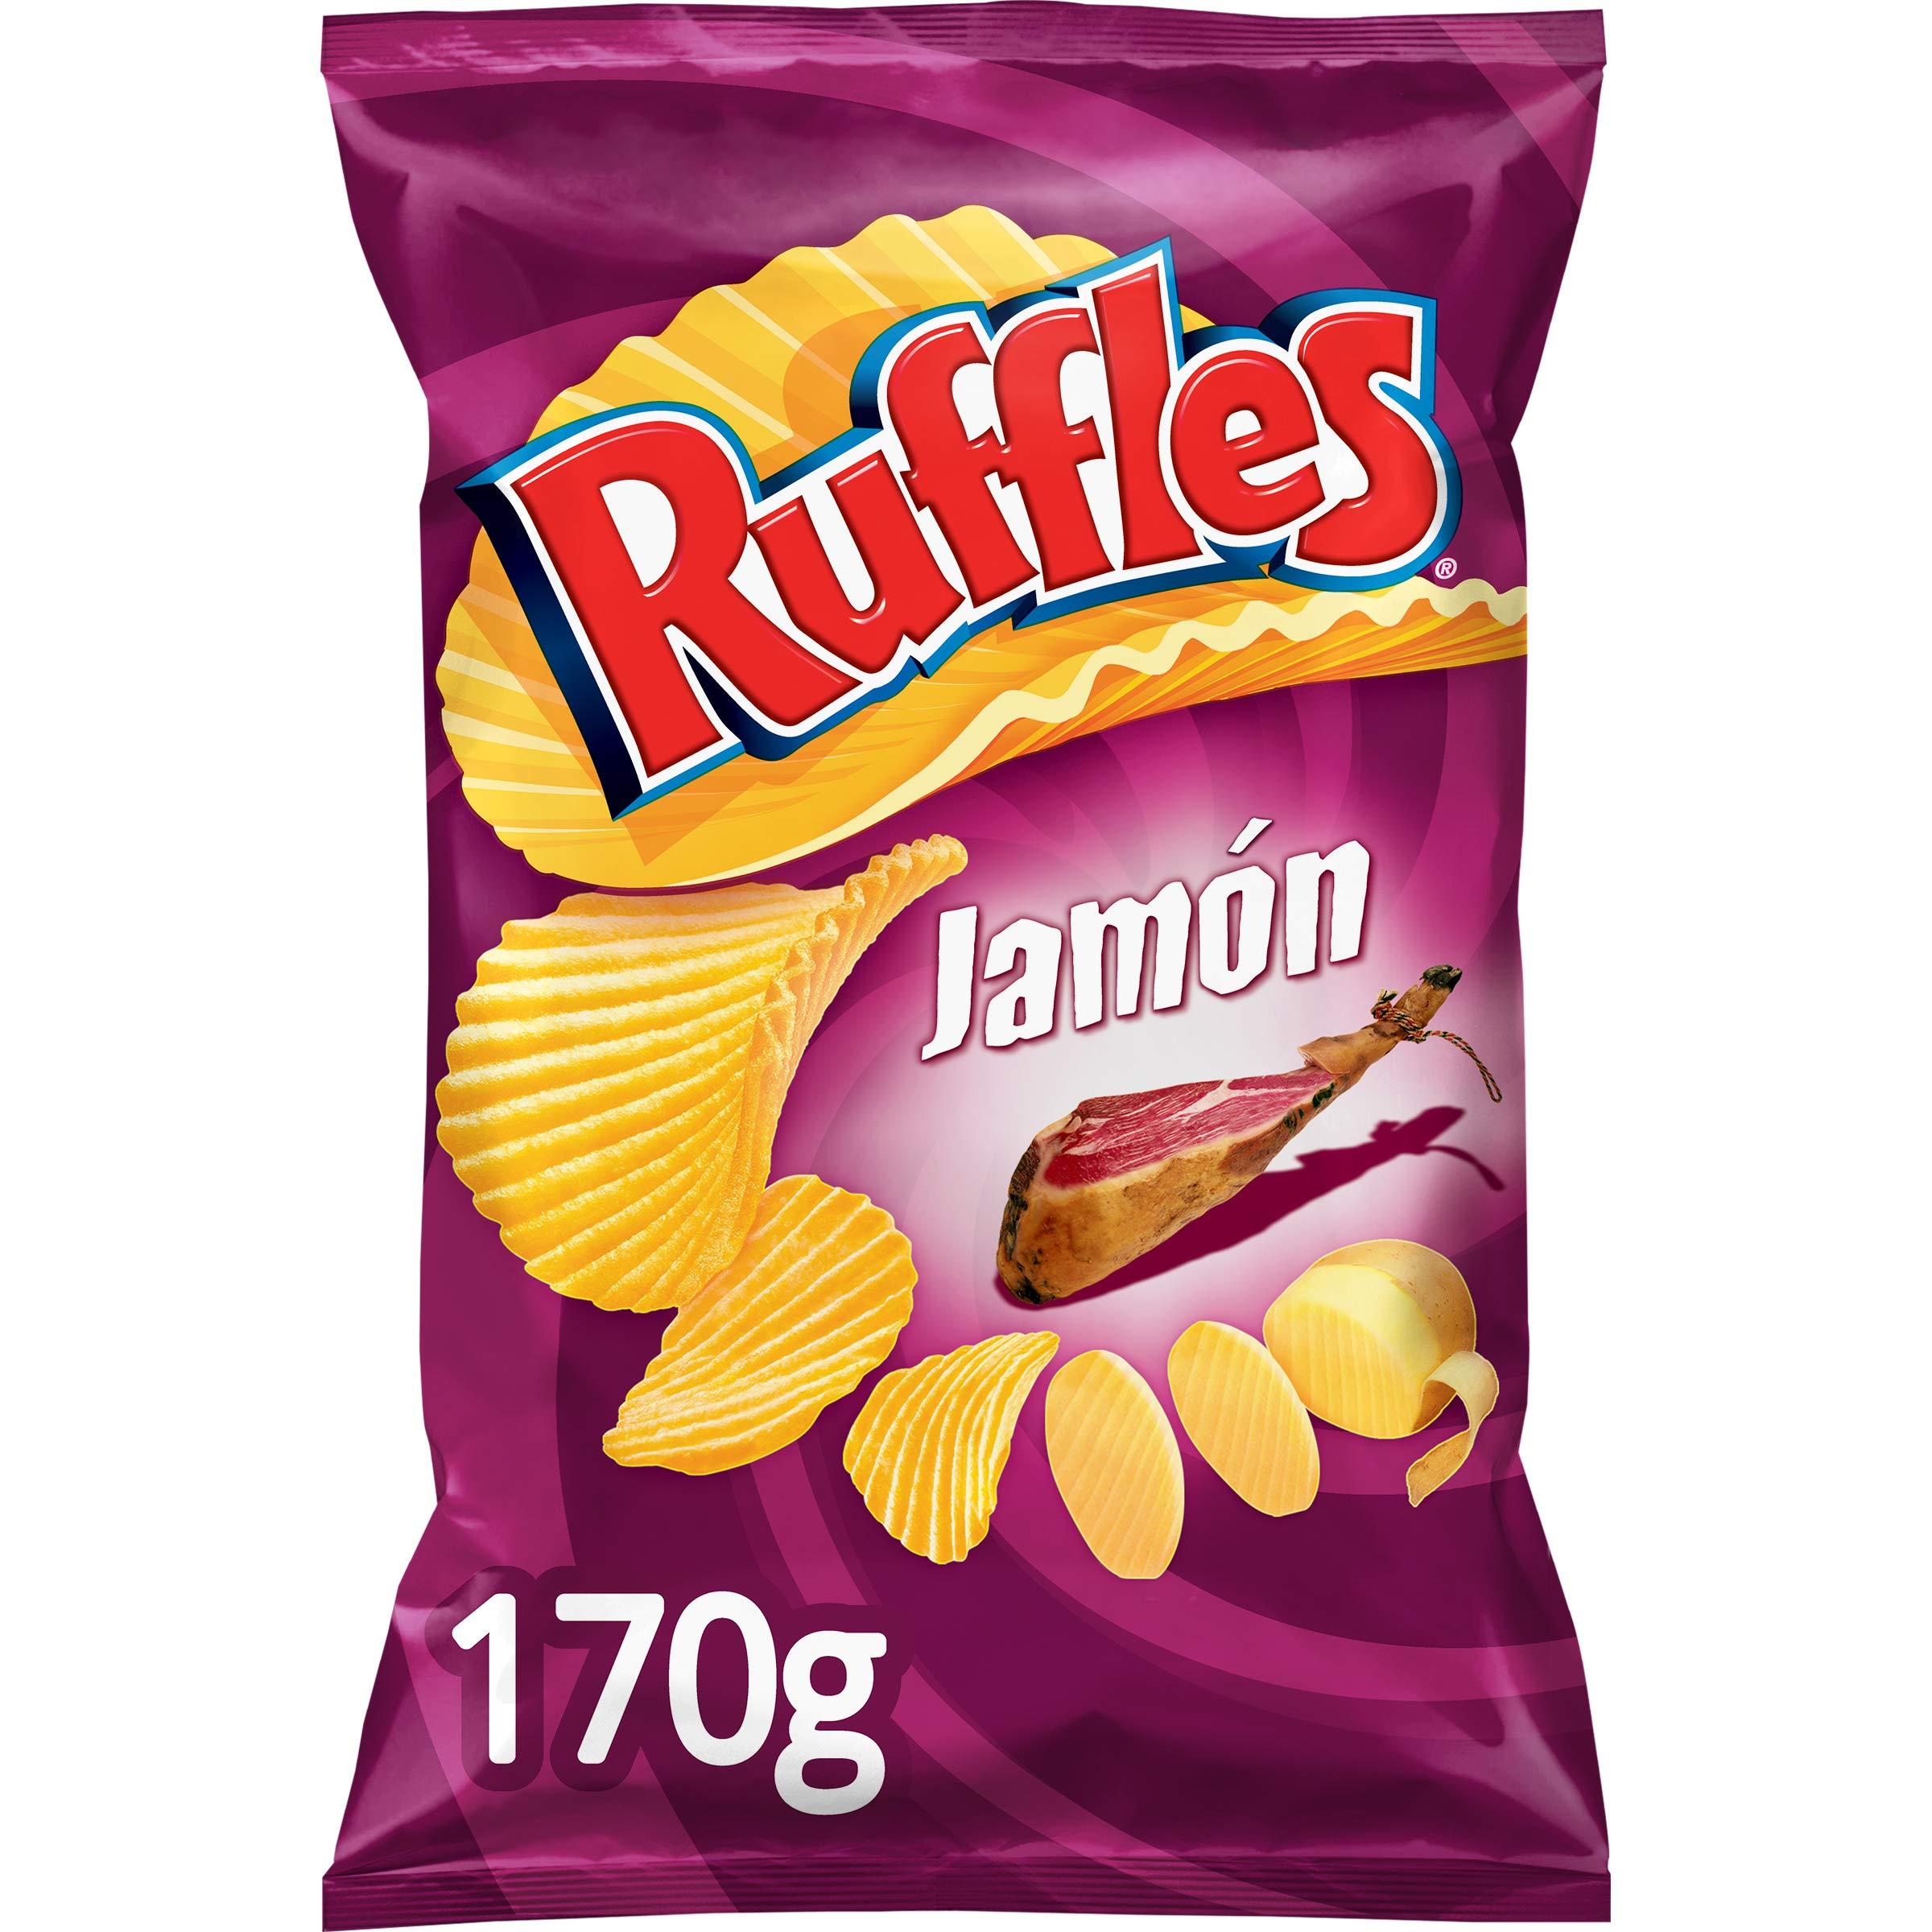 Ruffles jamon - crisps with Spanish ham flavour